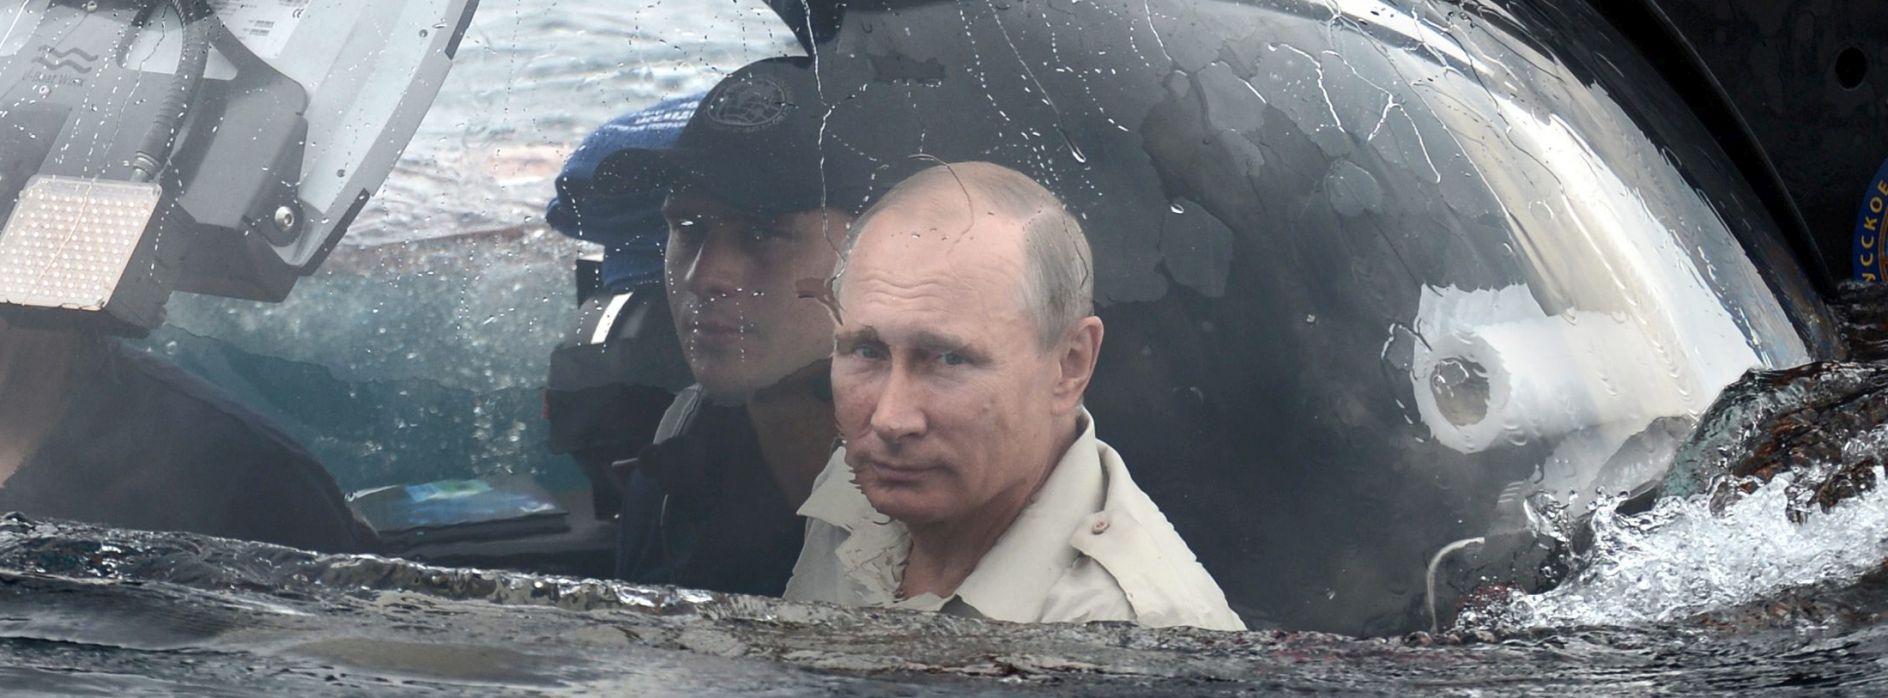 – 47 STUPNJEVA CELZIJUSA Rusija pred dovršetkom velike vojne baze na Arktiku